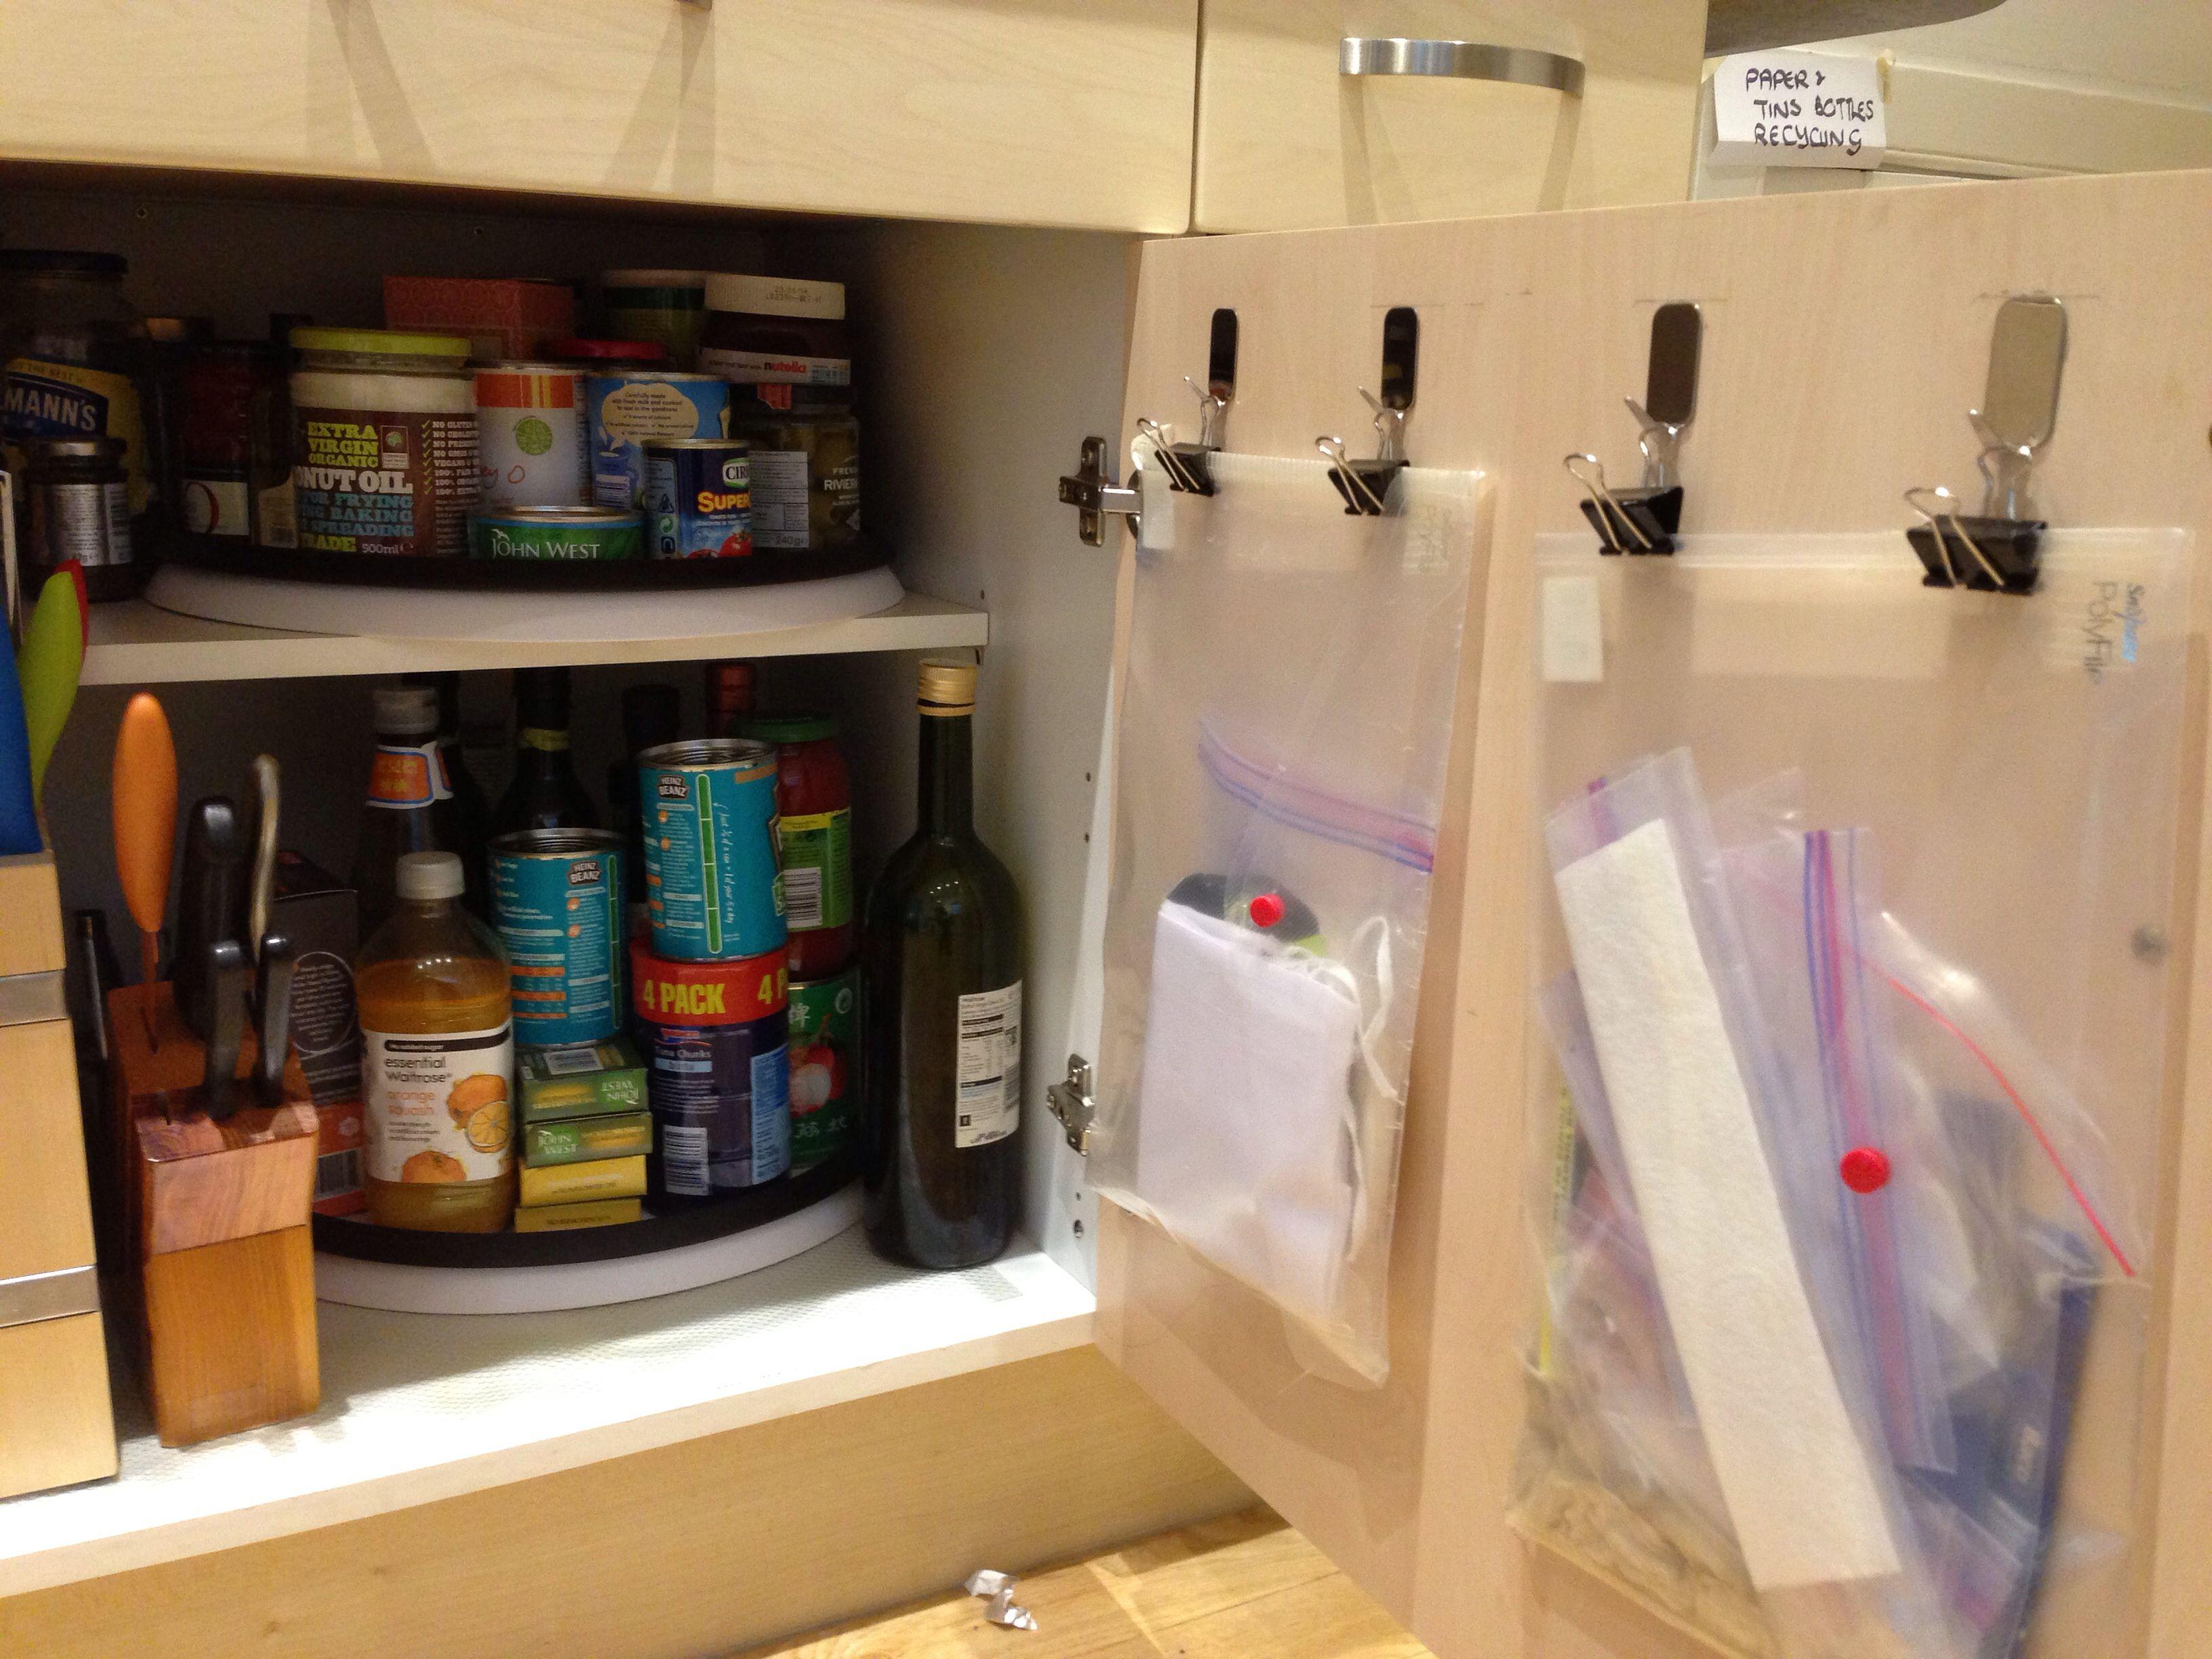 Pin By Jenny On Organization Cupboard Kitchen Cabinets Storage Organizers Retro Record Cabinet